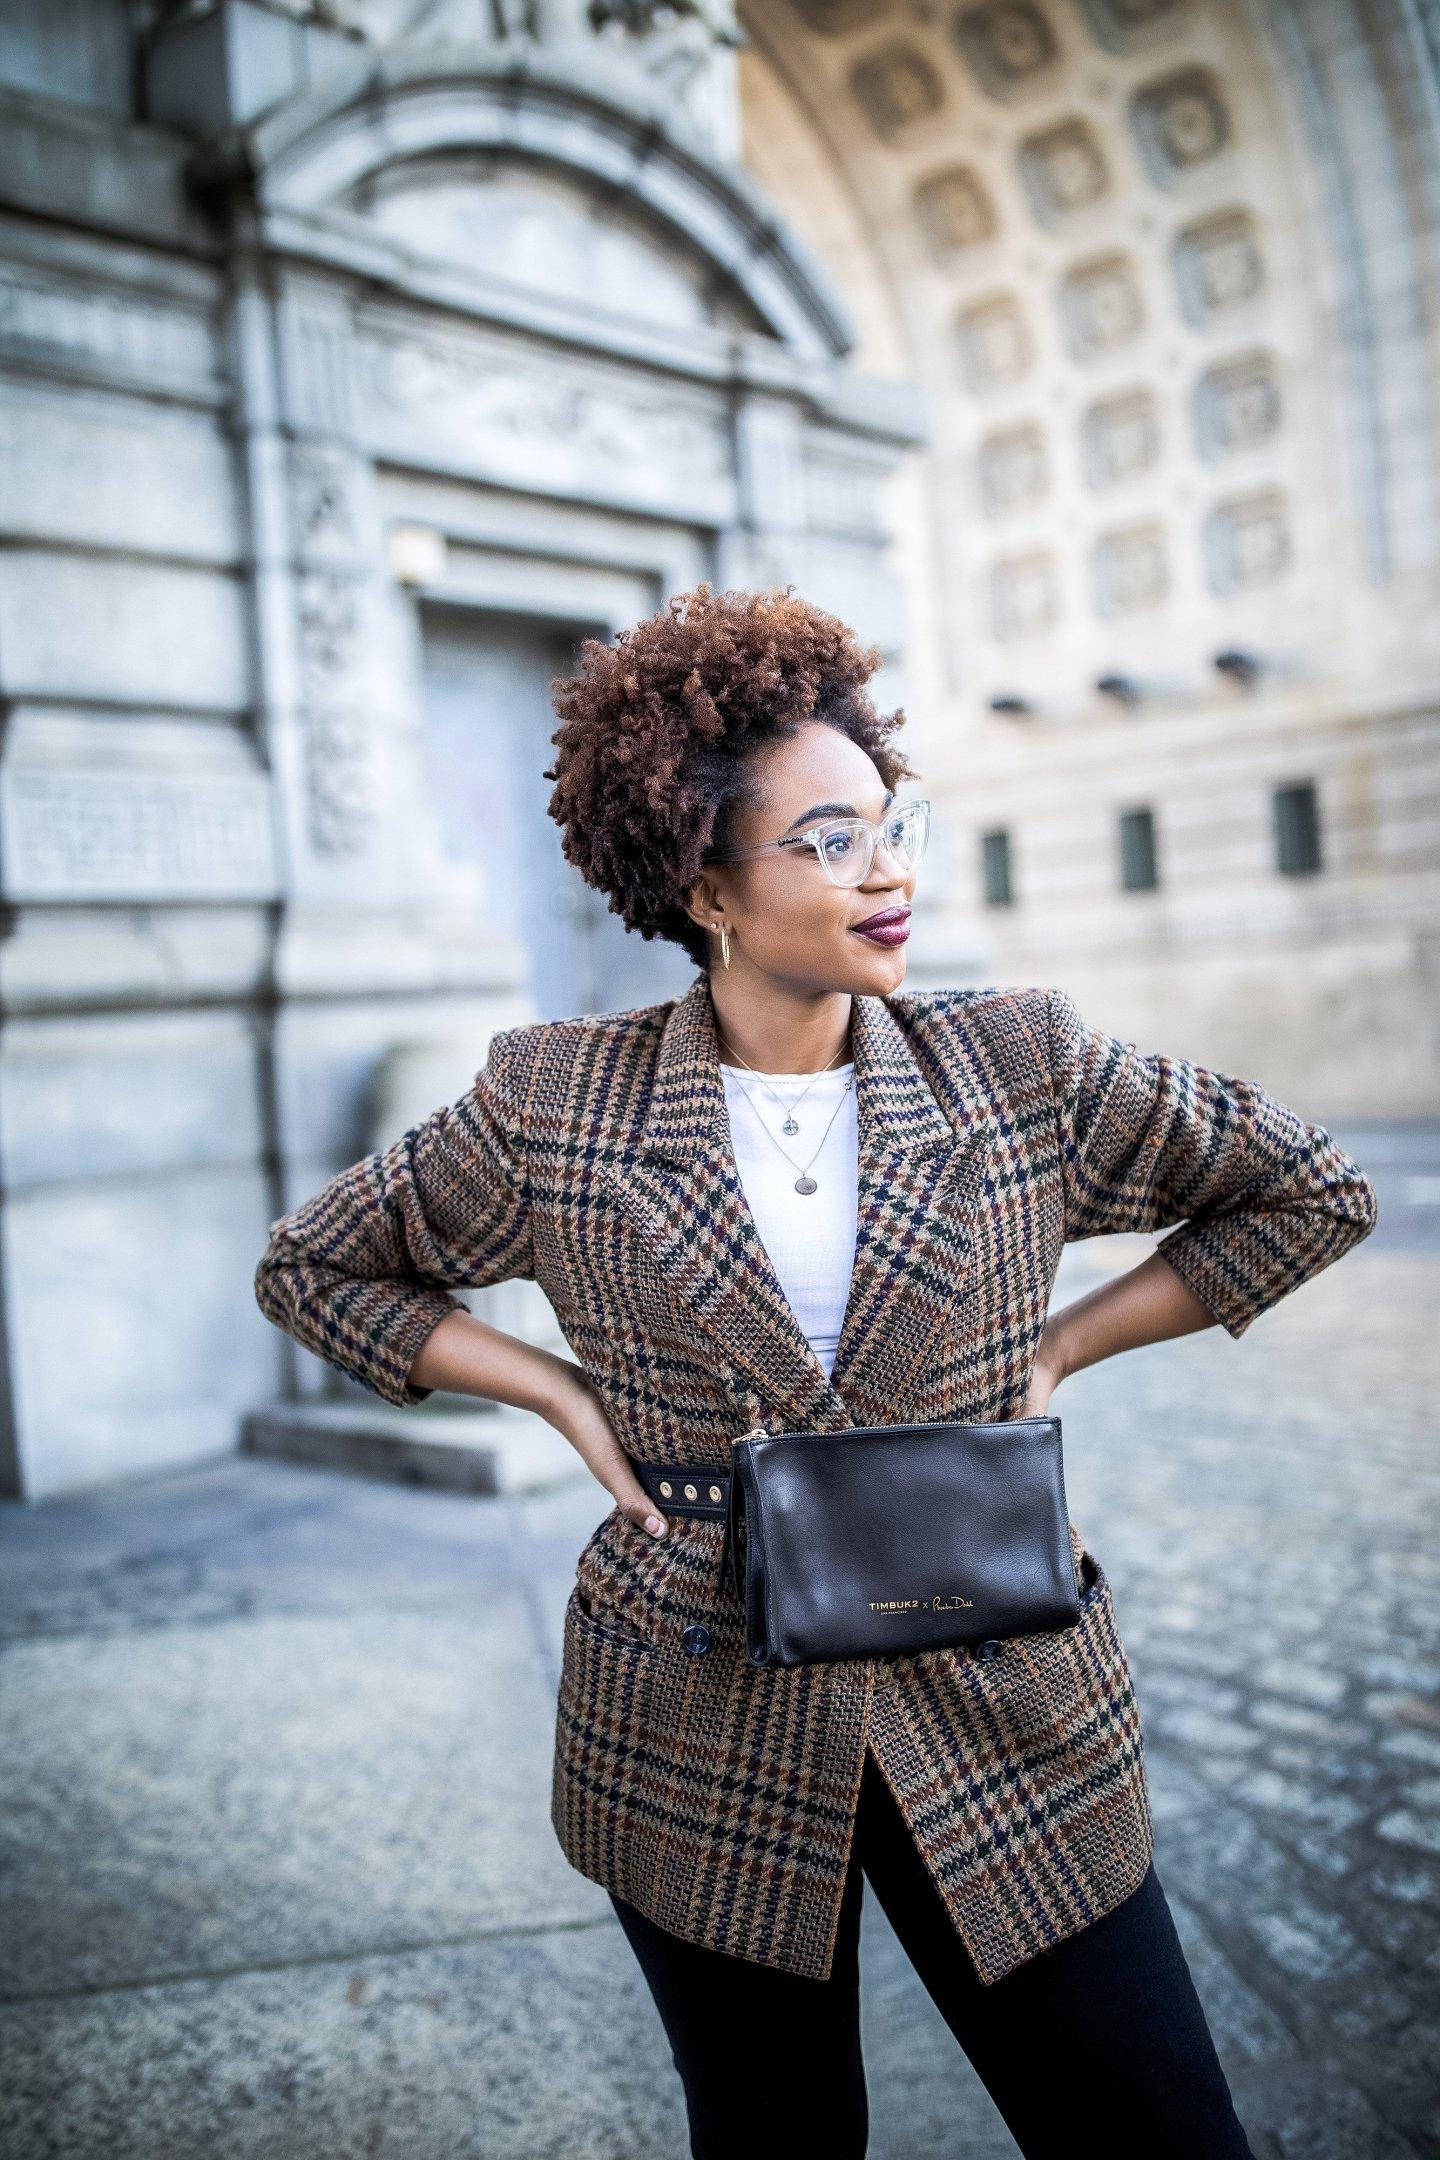 Lifestyle blogger Ijeoma Kola wears vintage Gucci blazer, belt bag, and burberry eyeglasses